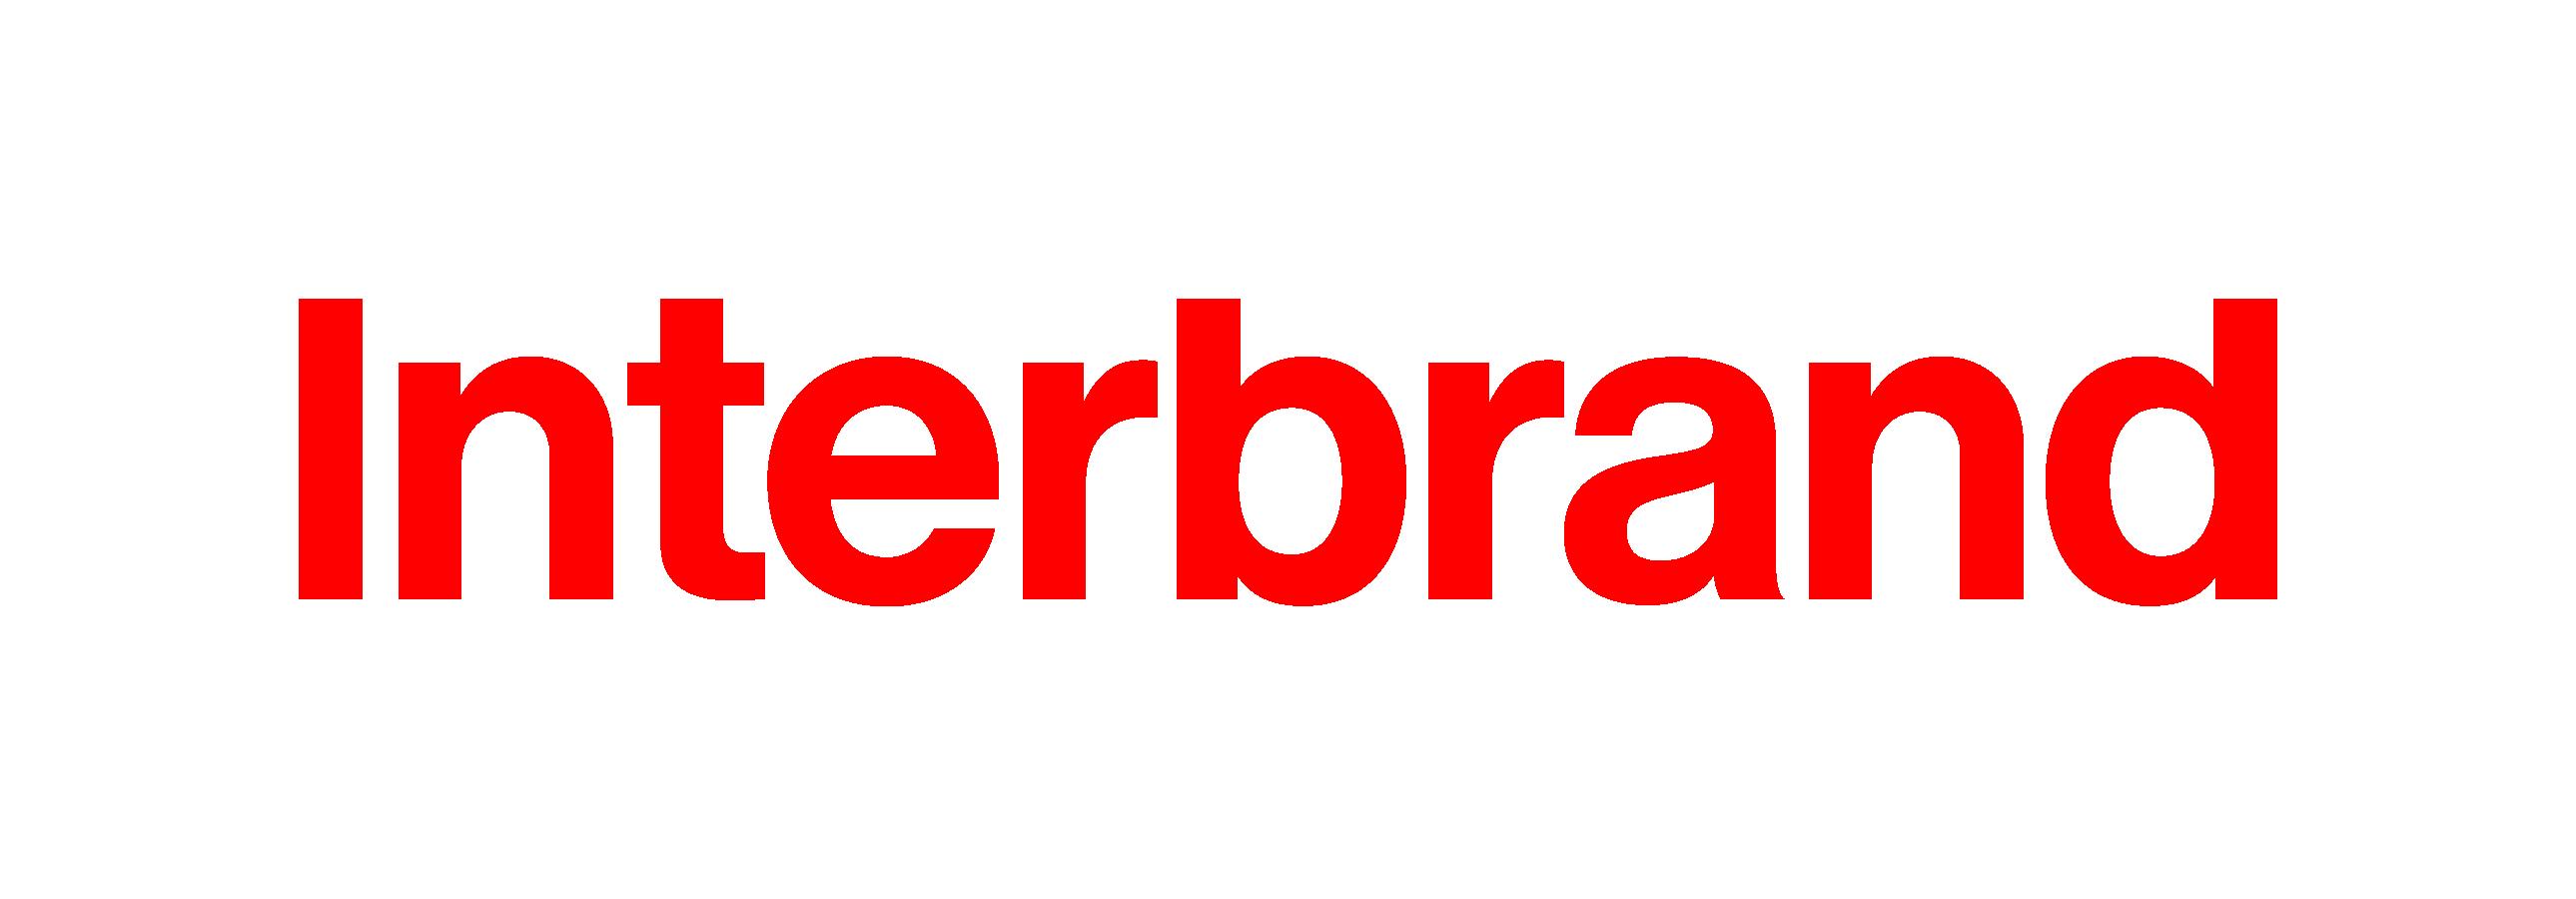 Interbrand logo red 1